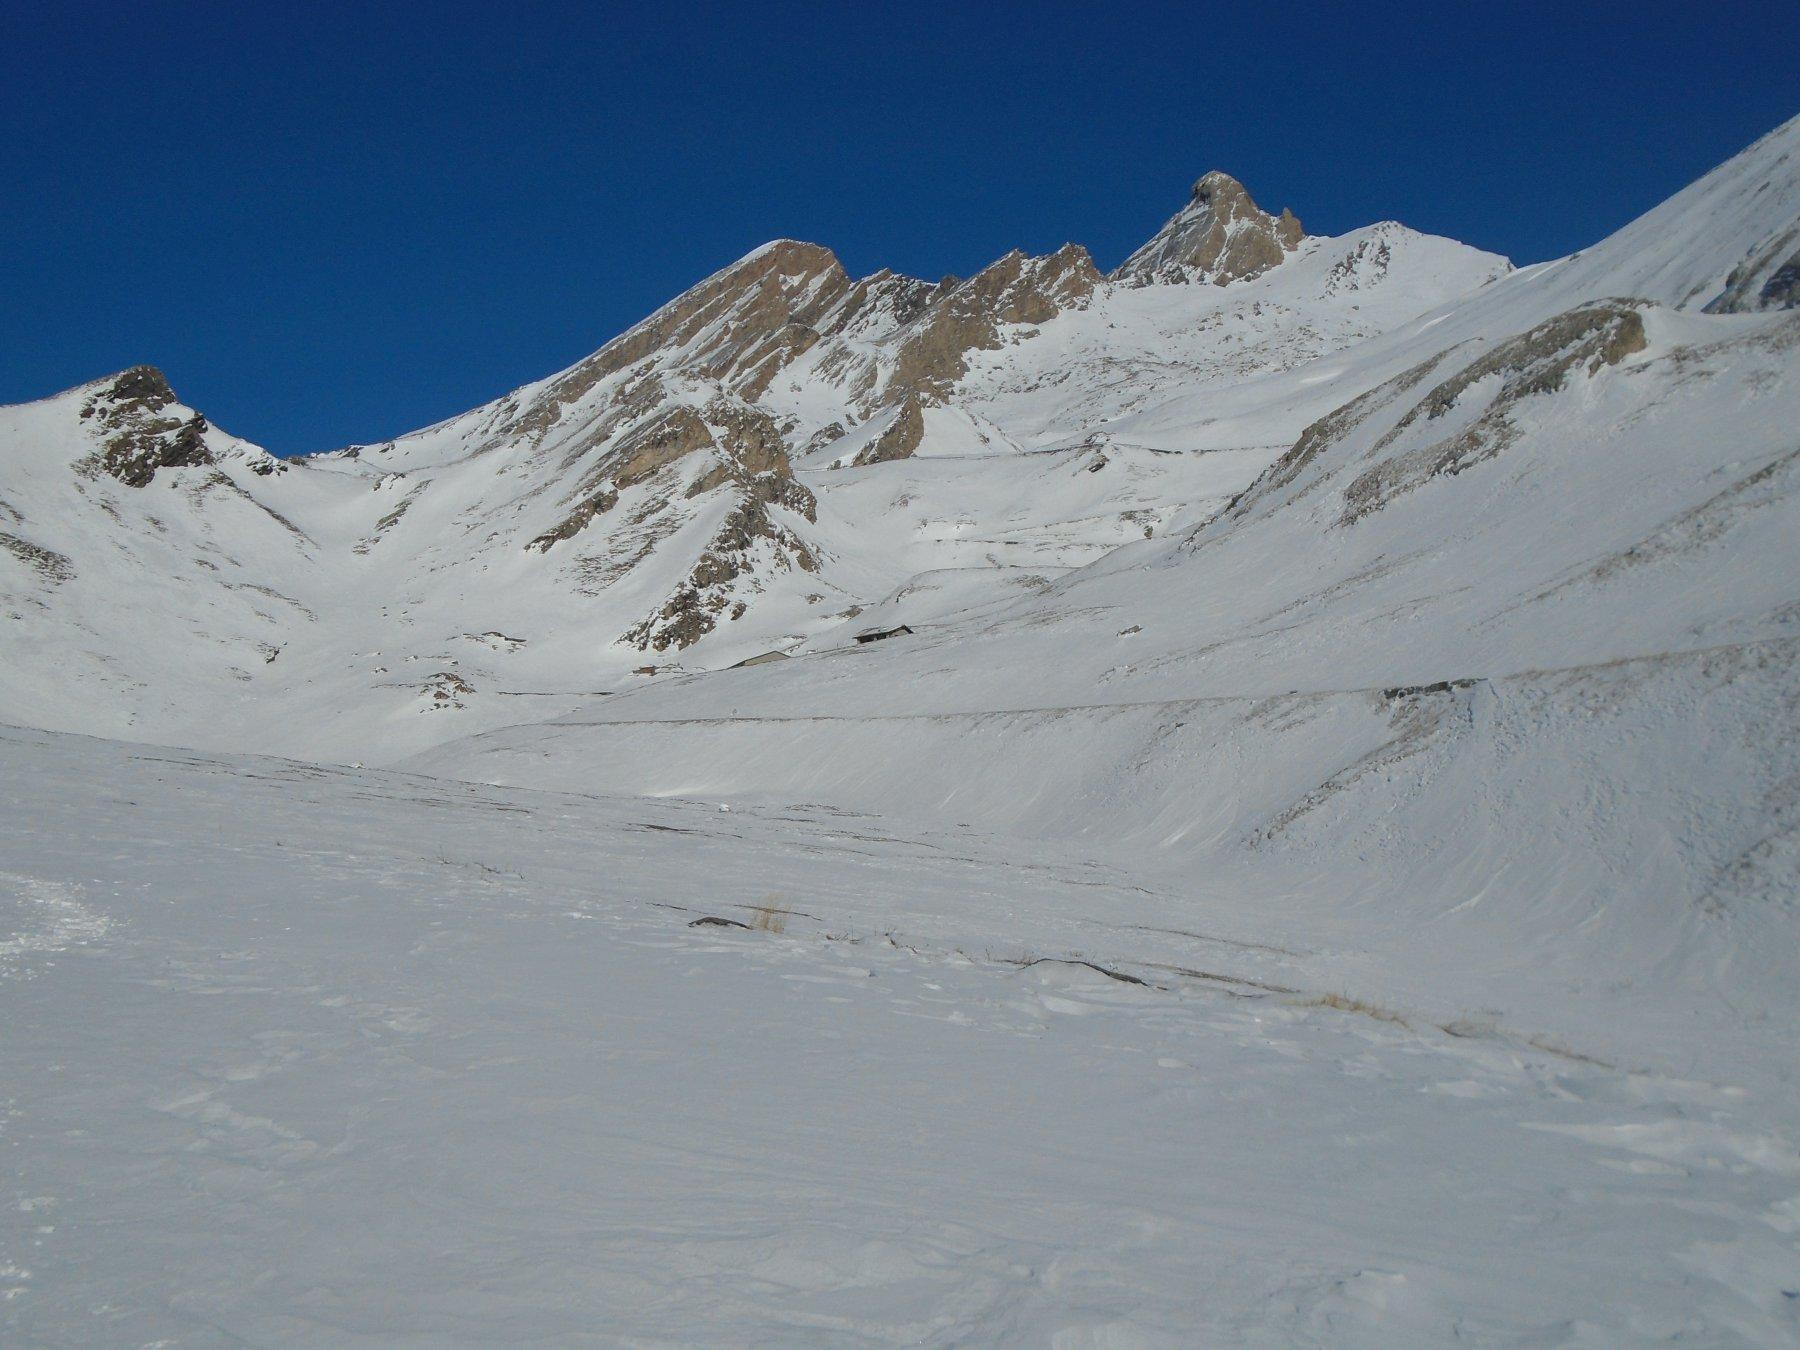 Poca neve sul versante sx orografico